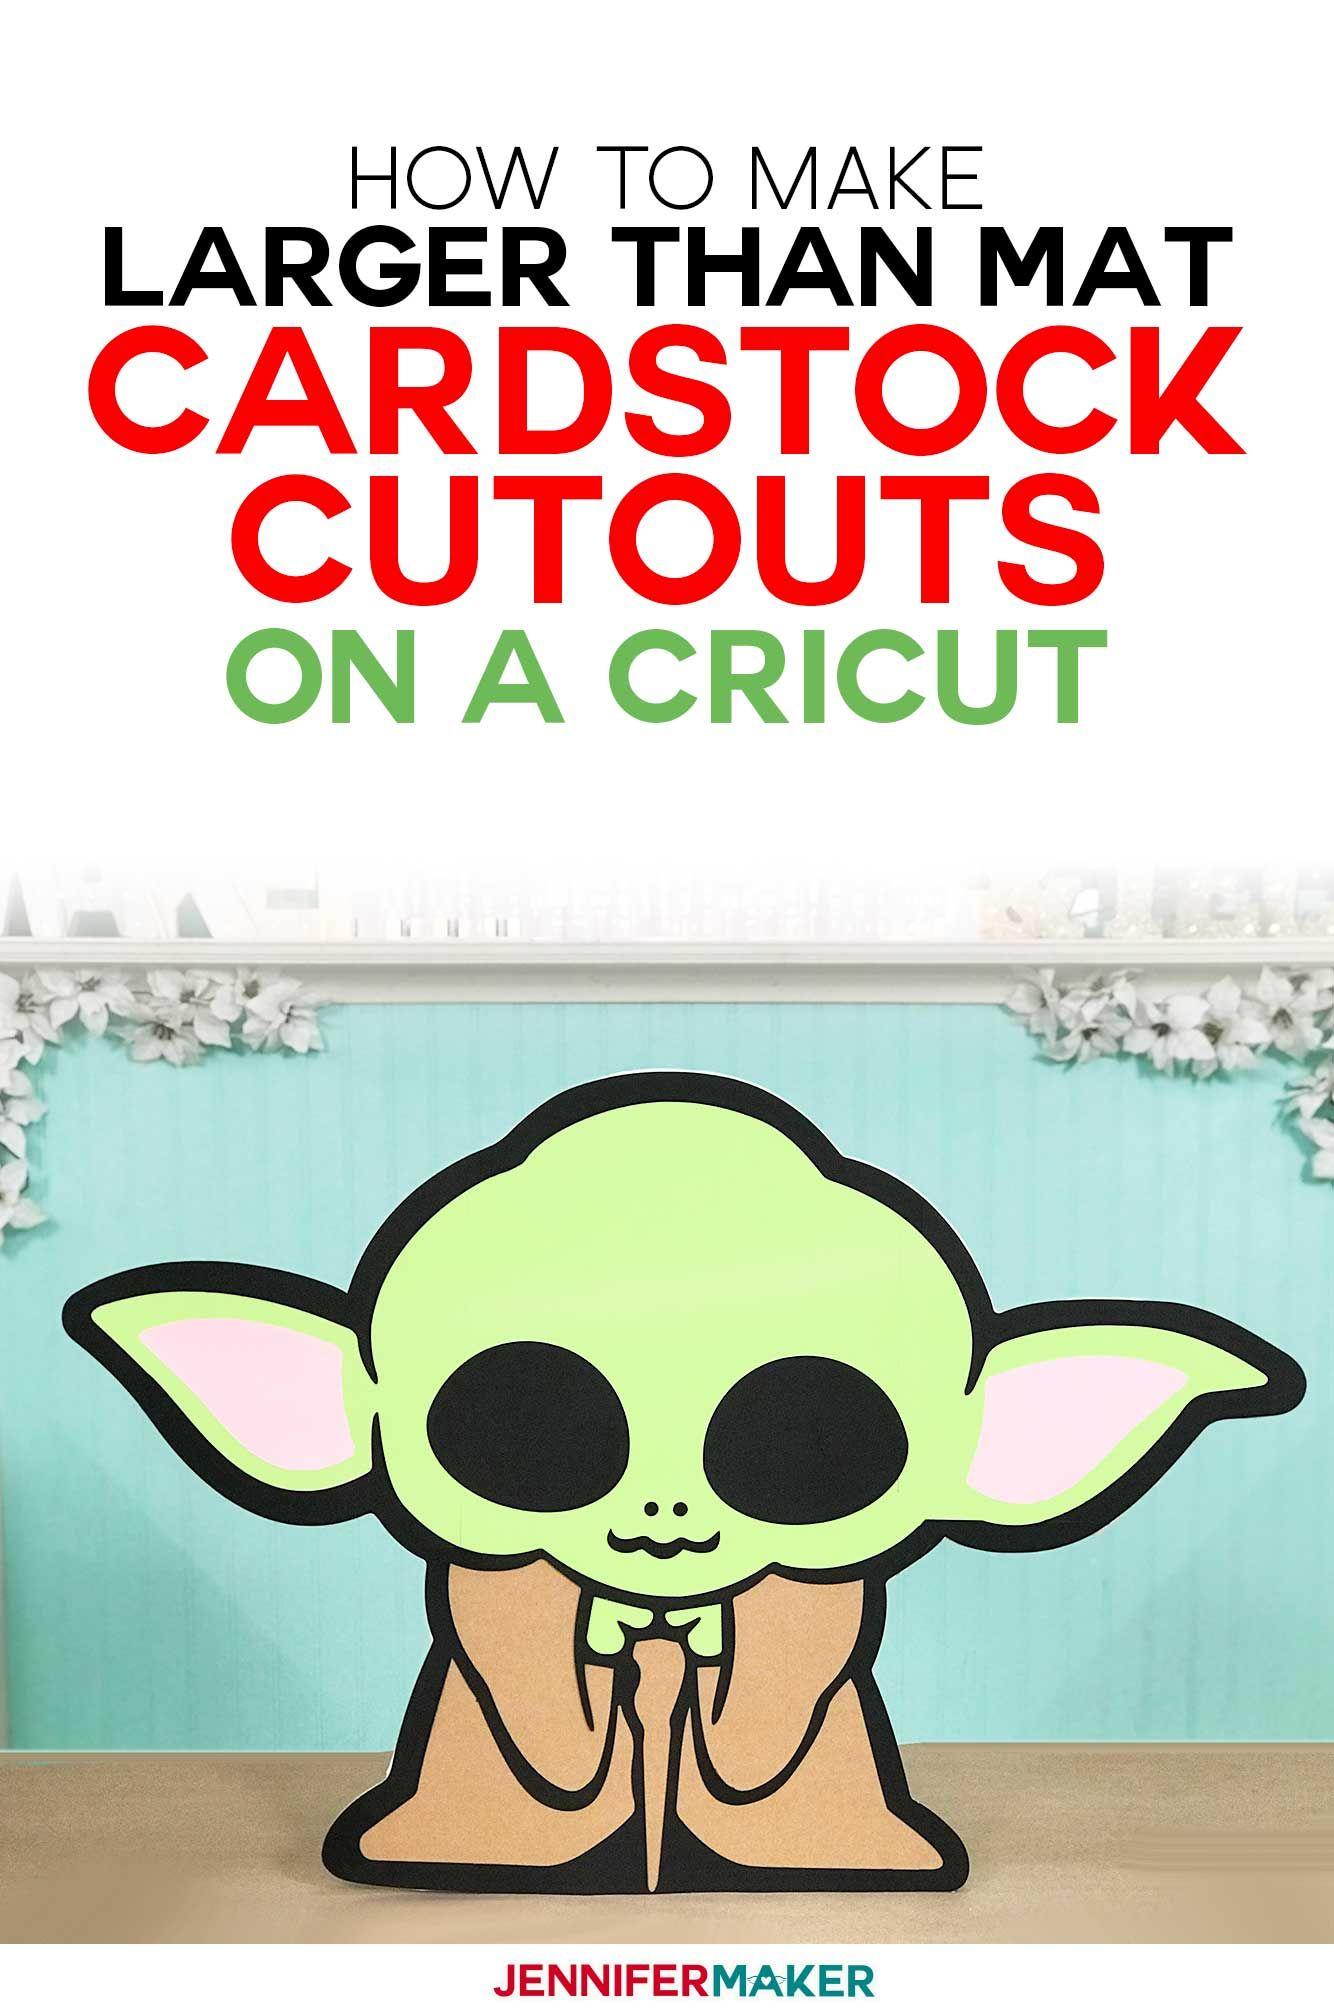 Baby Yoda Cricut Image : cricut, image, Cardstock, Cutouts, Larger, Jennifer, Maker, Stock,, Cricut,, Cricut, Tutorials